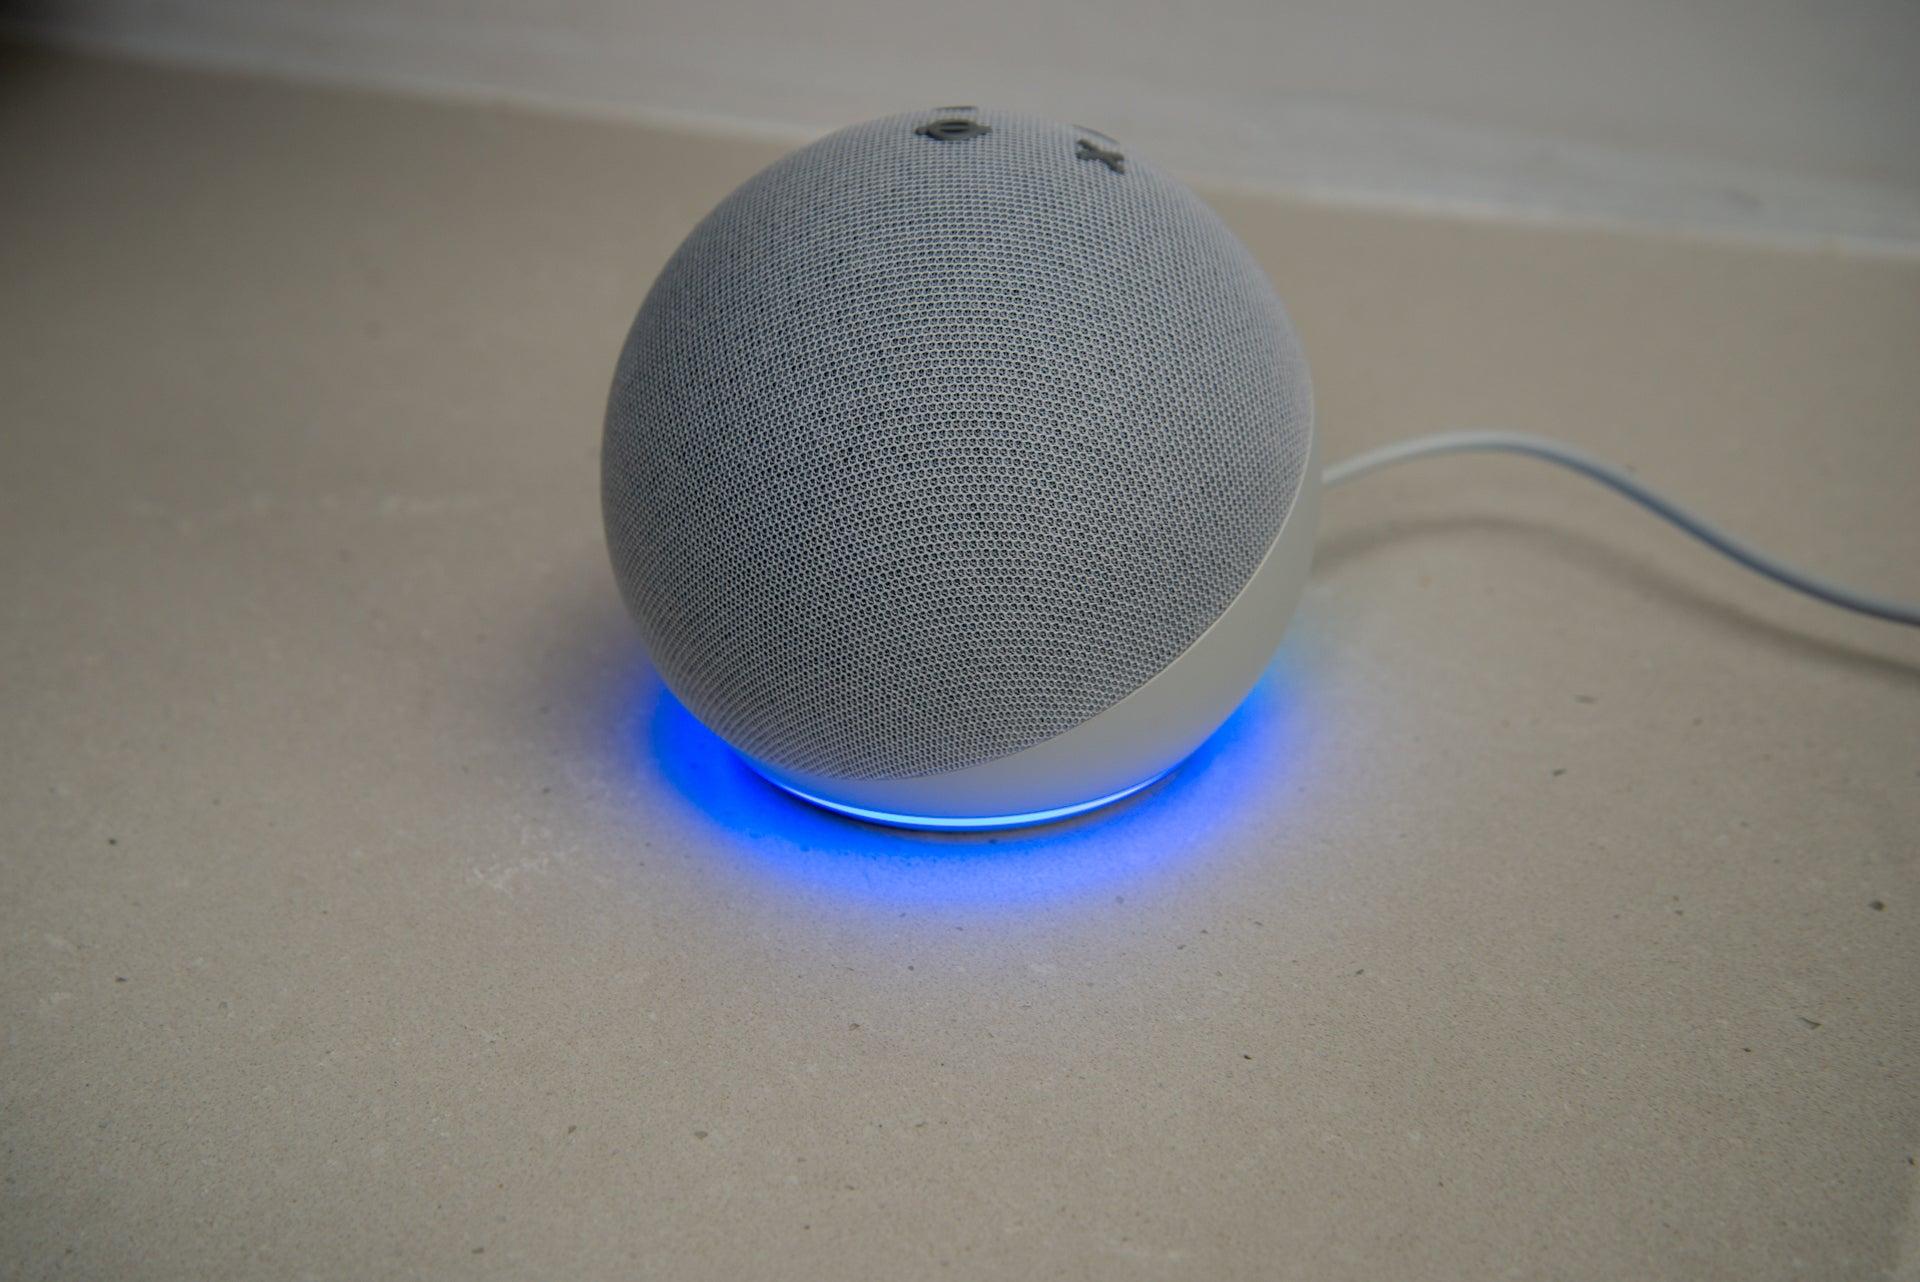 Amazon Echo Dot (4th Generation) side view lights